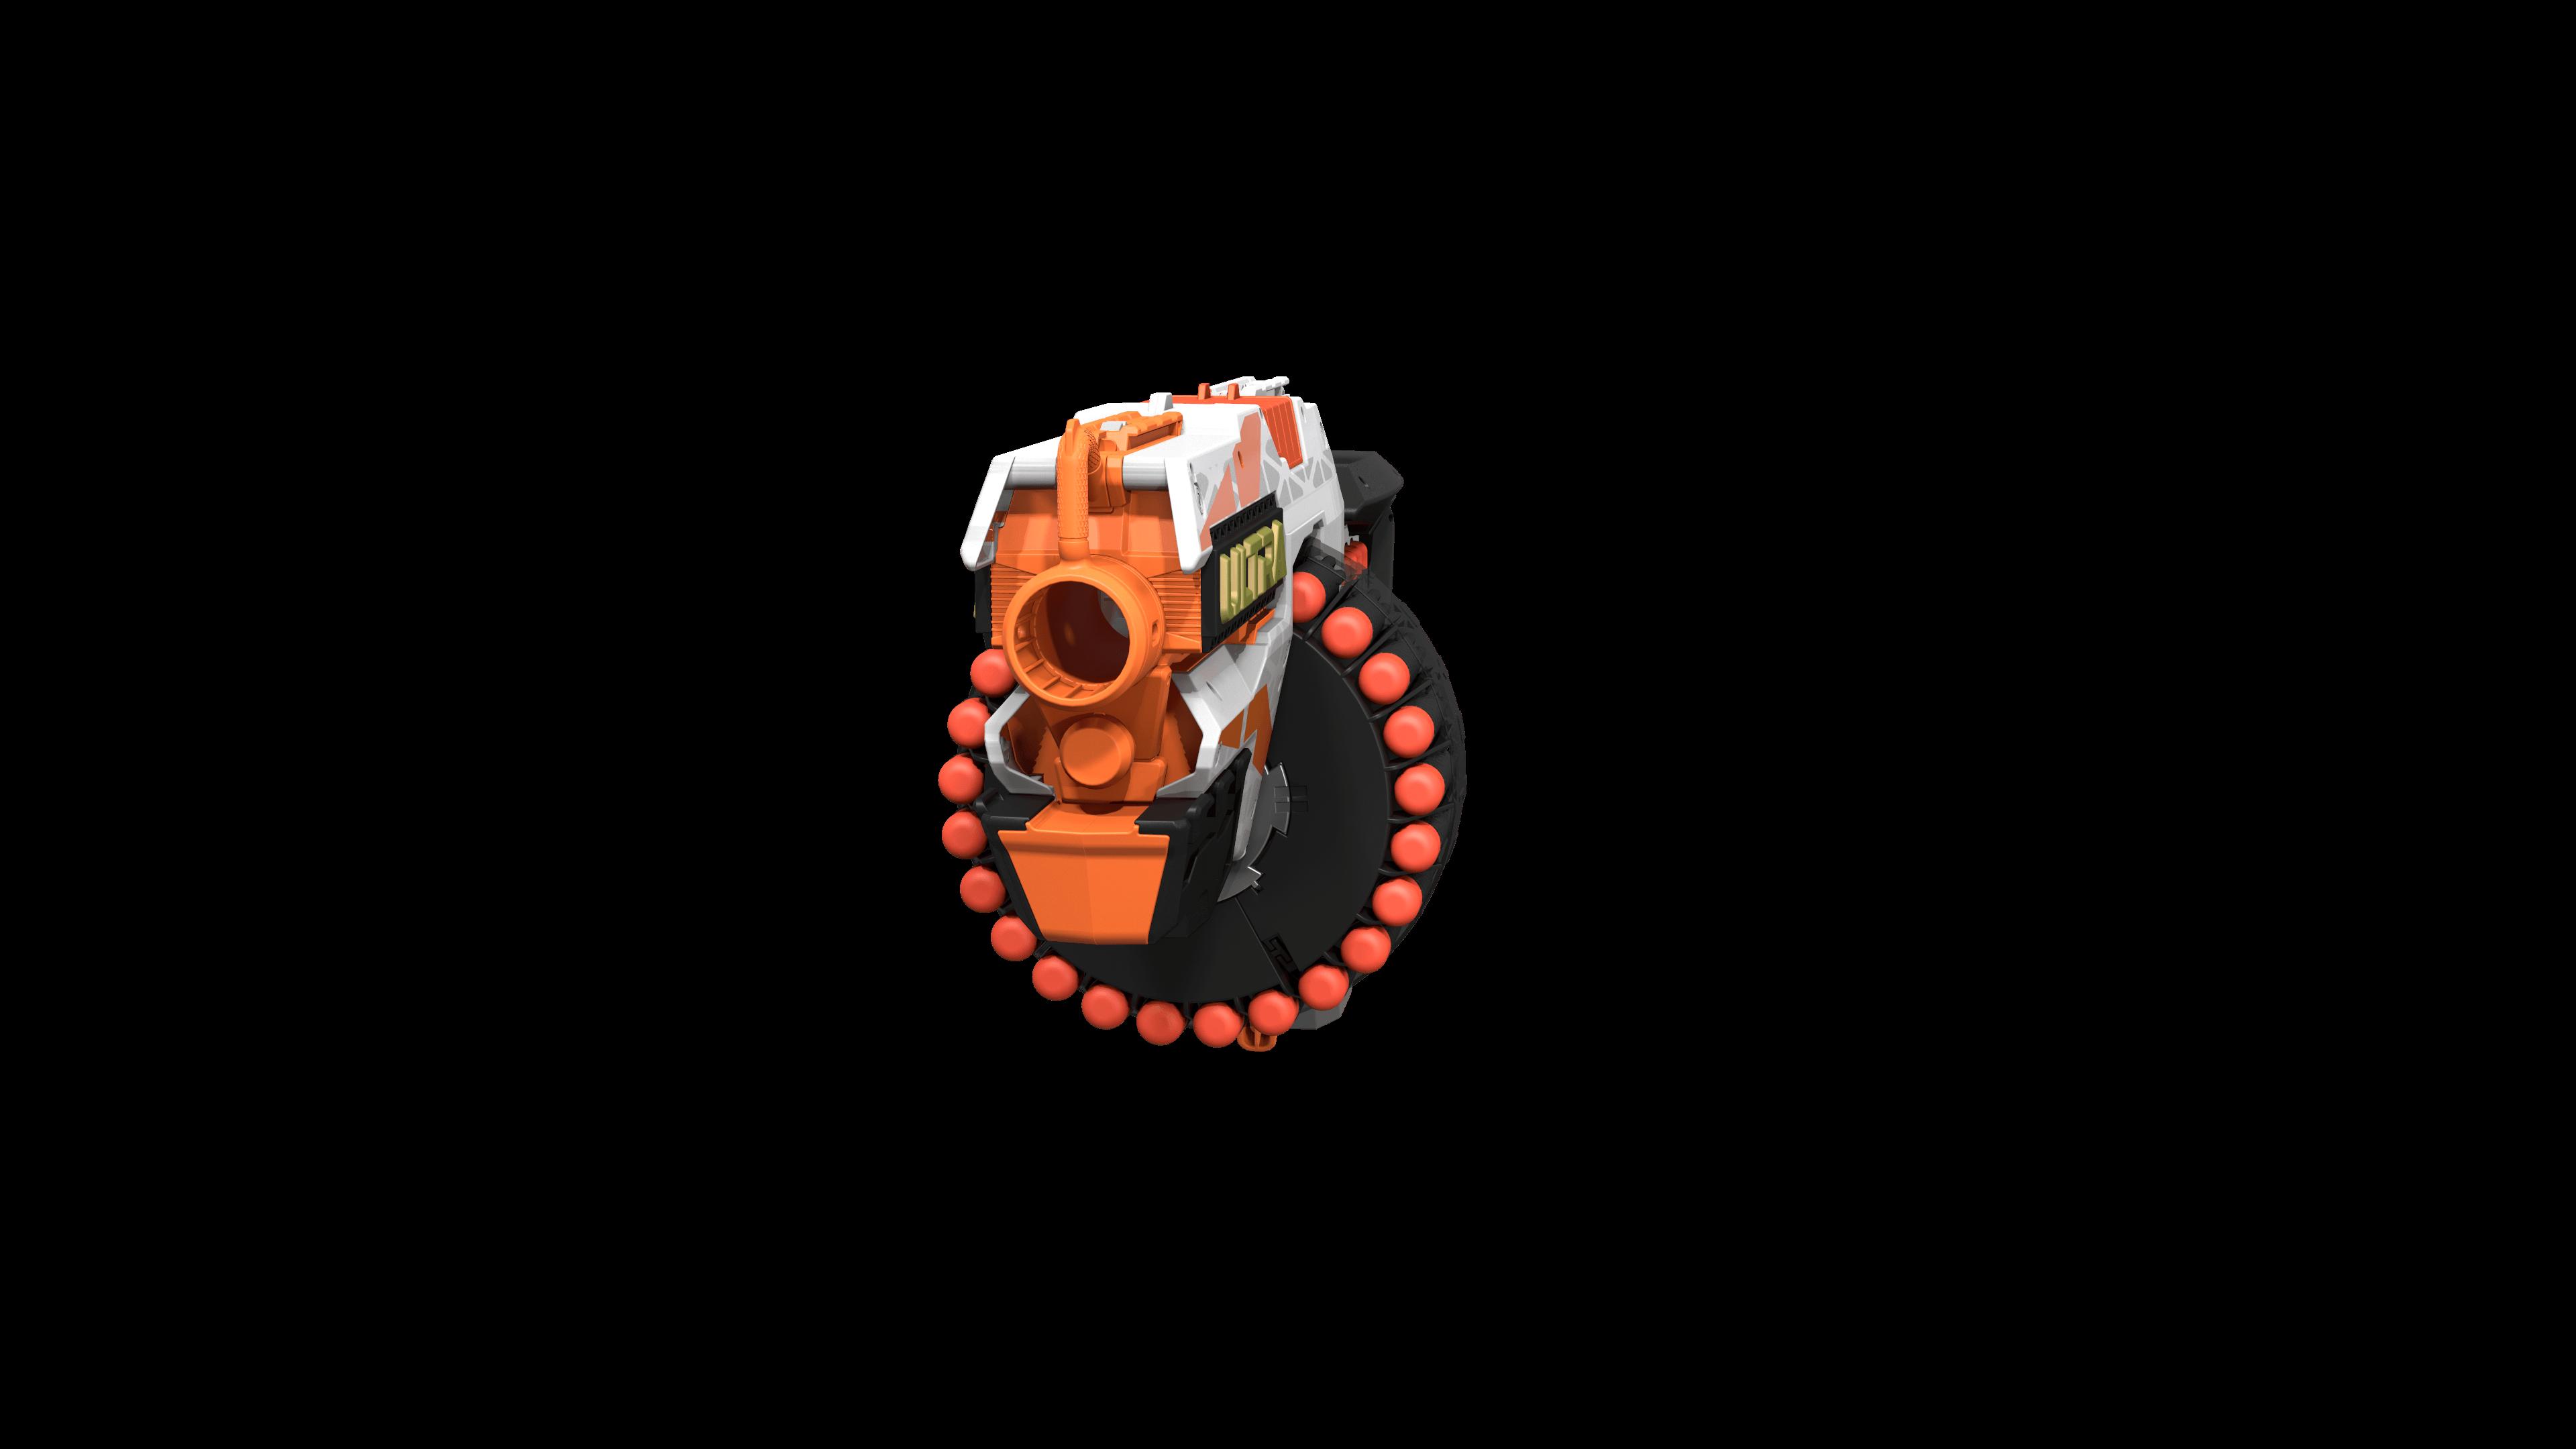 ultra blaster img 88